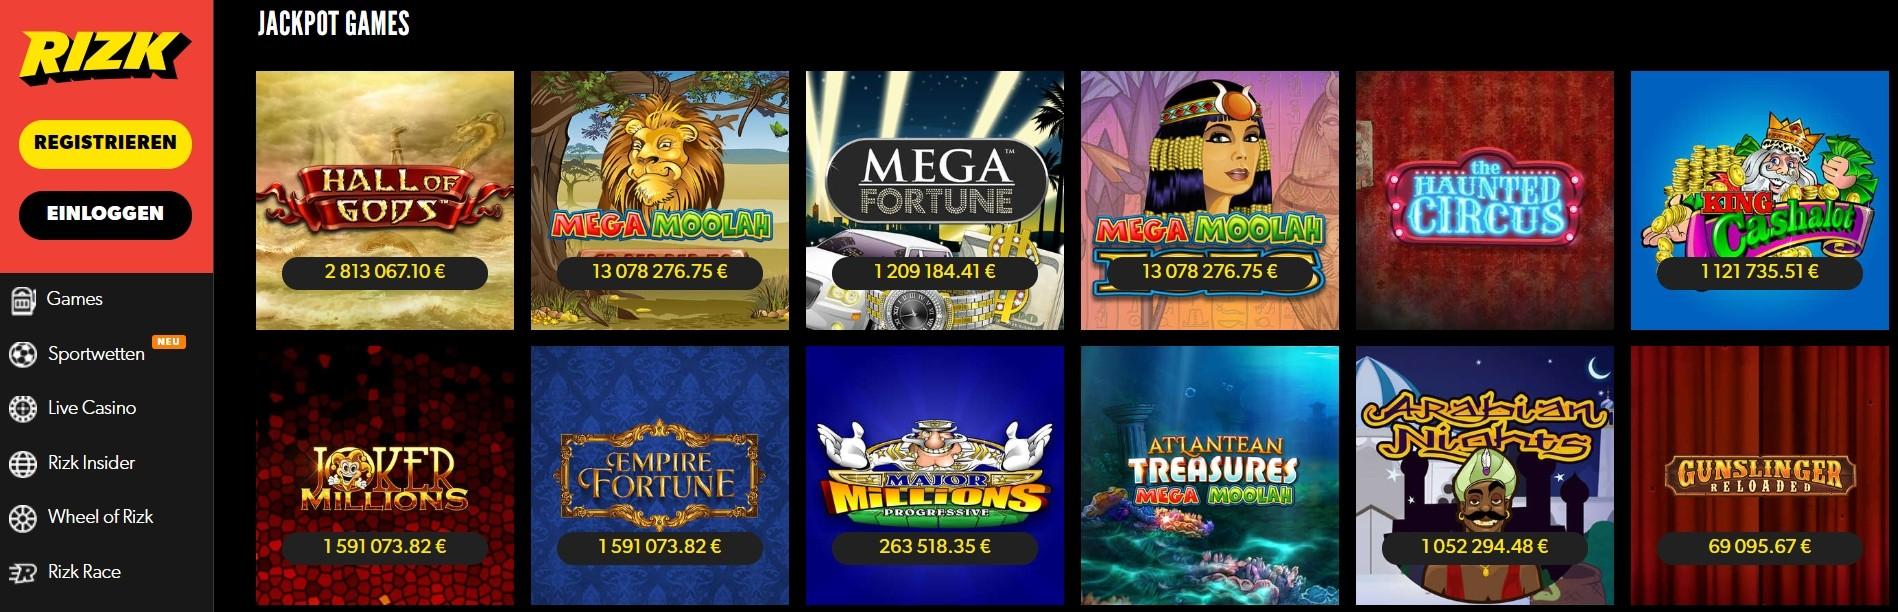 Rizk Casino Jackpots